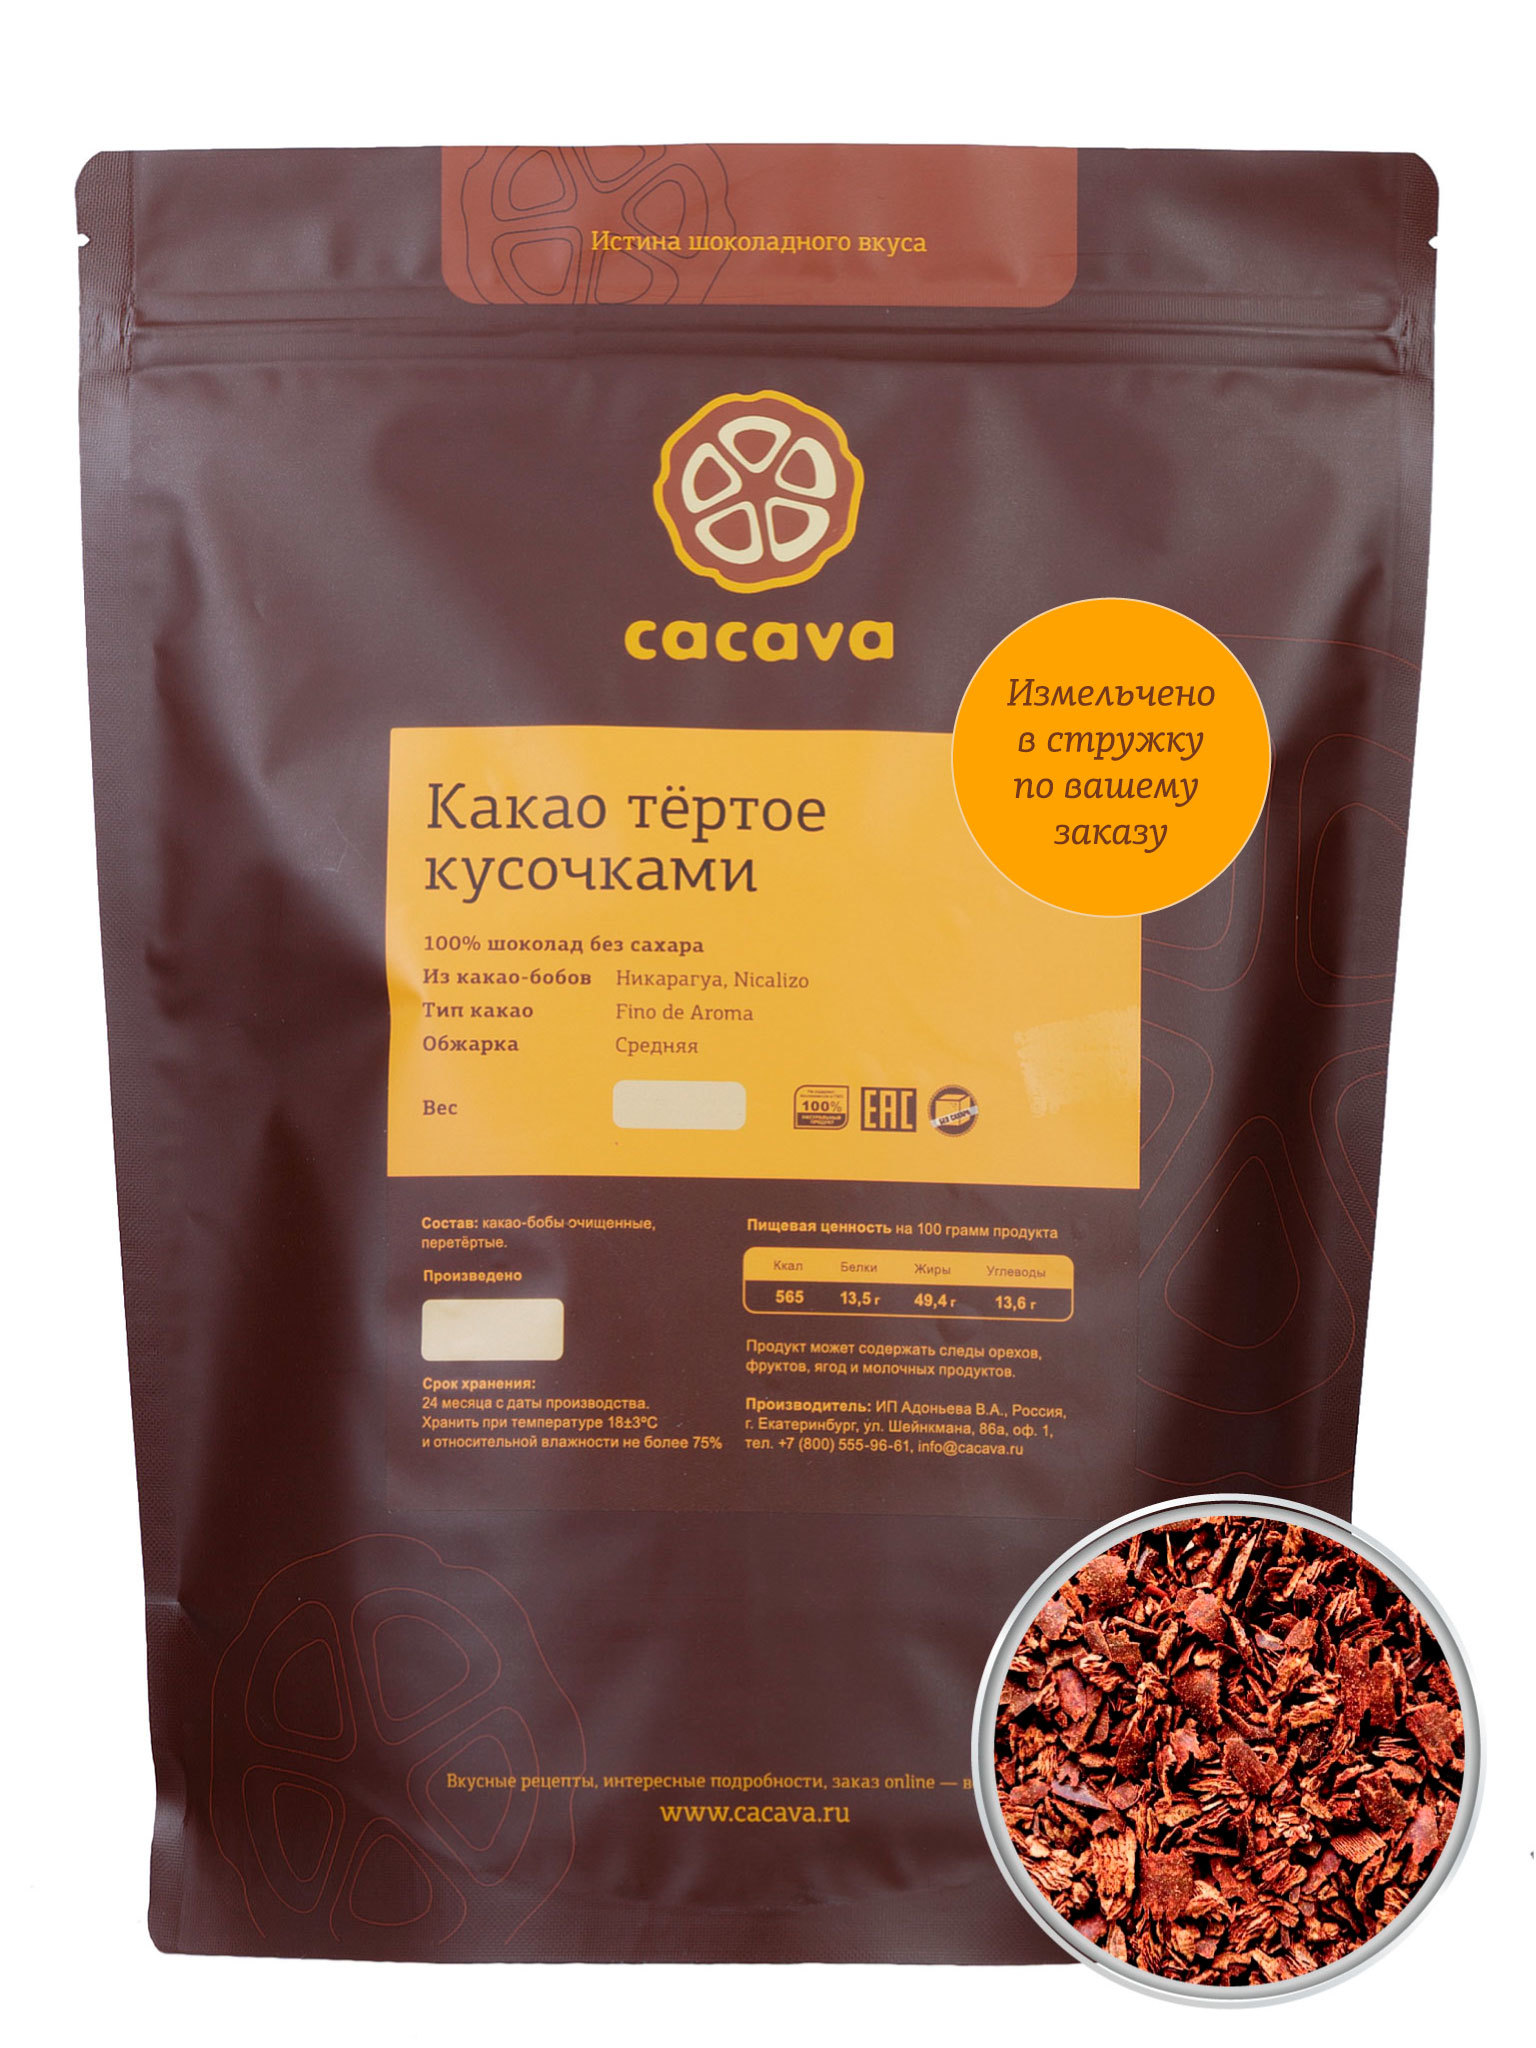 Какао тёртое в стружке (Никарагуа, Nicalizo), упаковка 1 кг